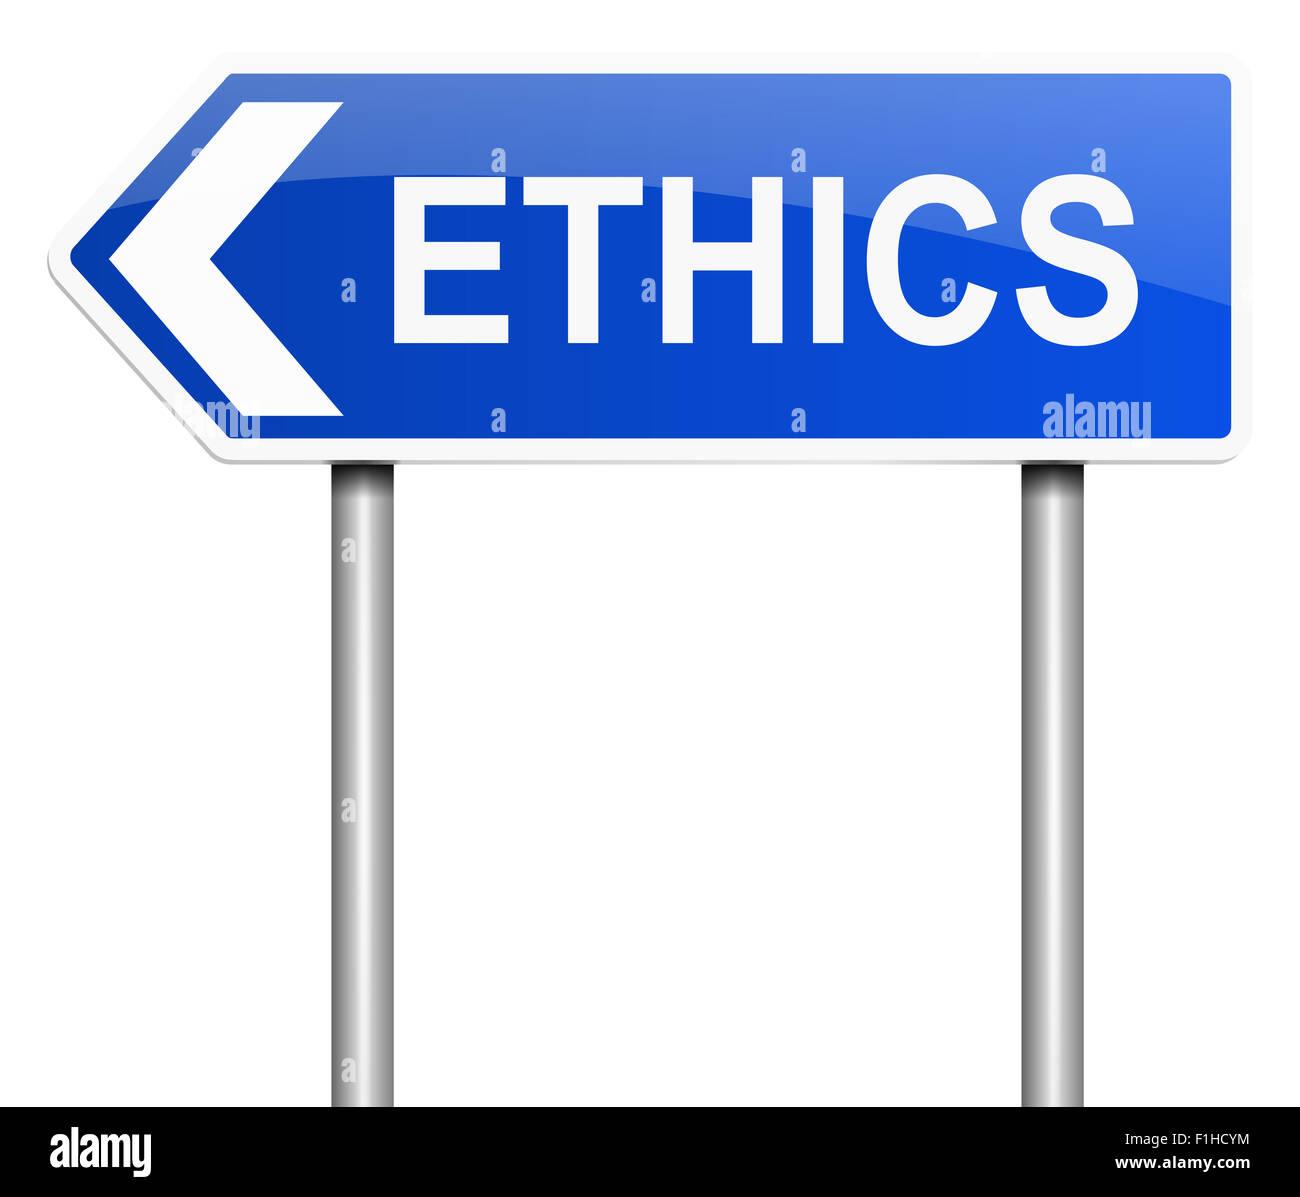 Ethics concept. - Stock Image